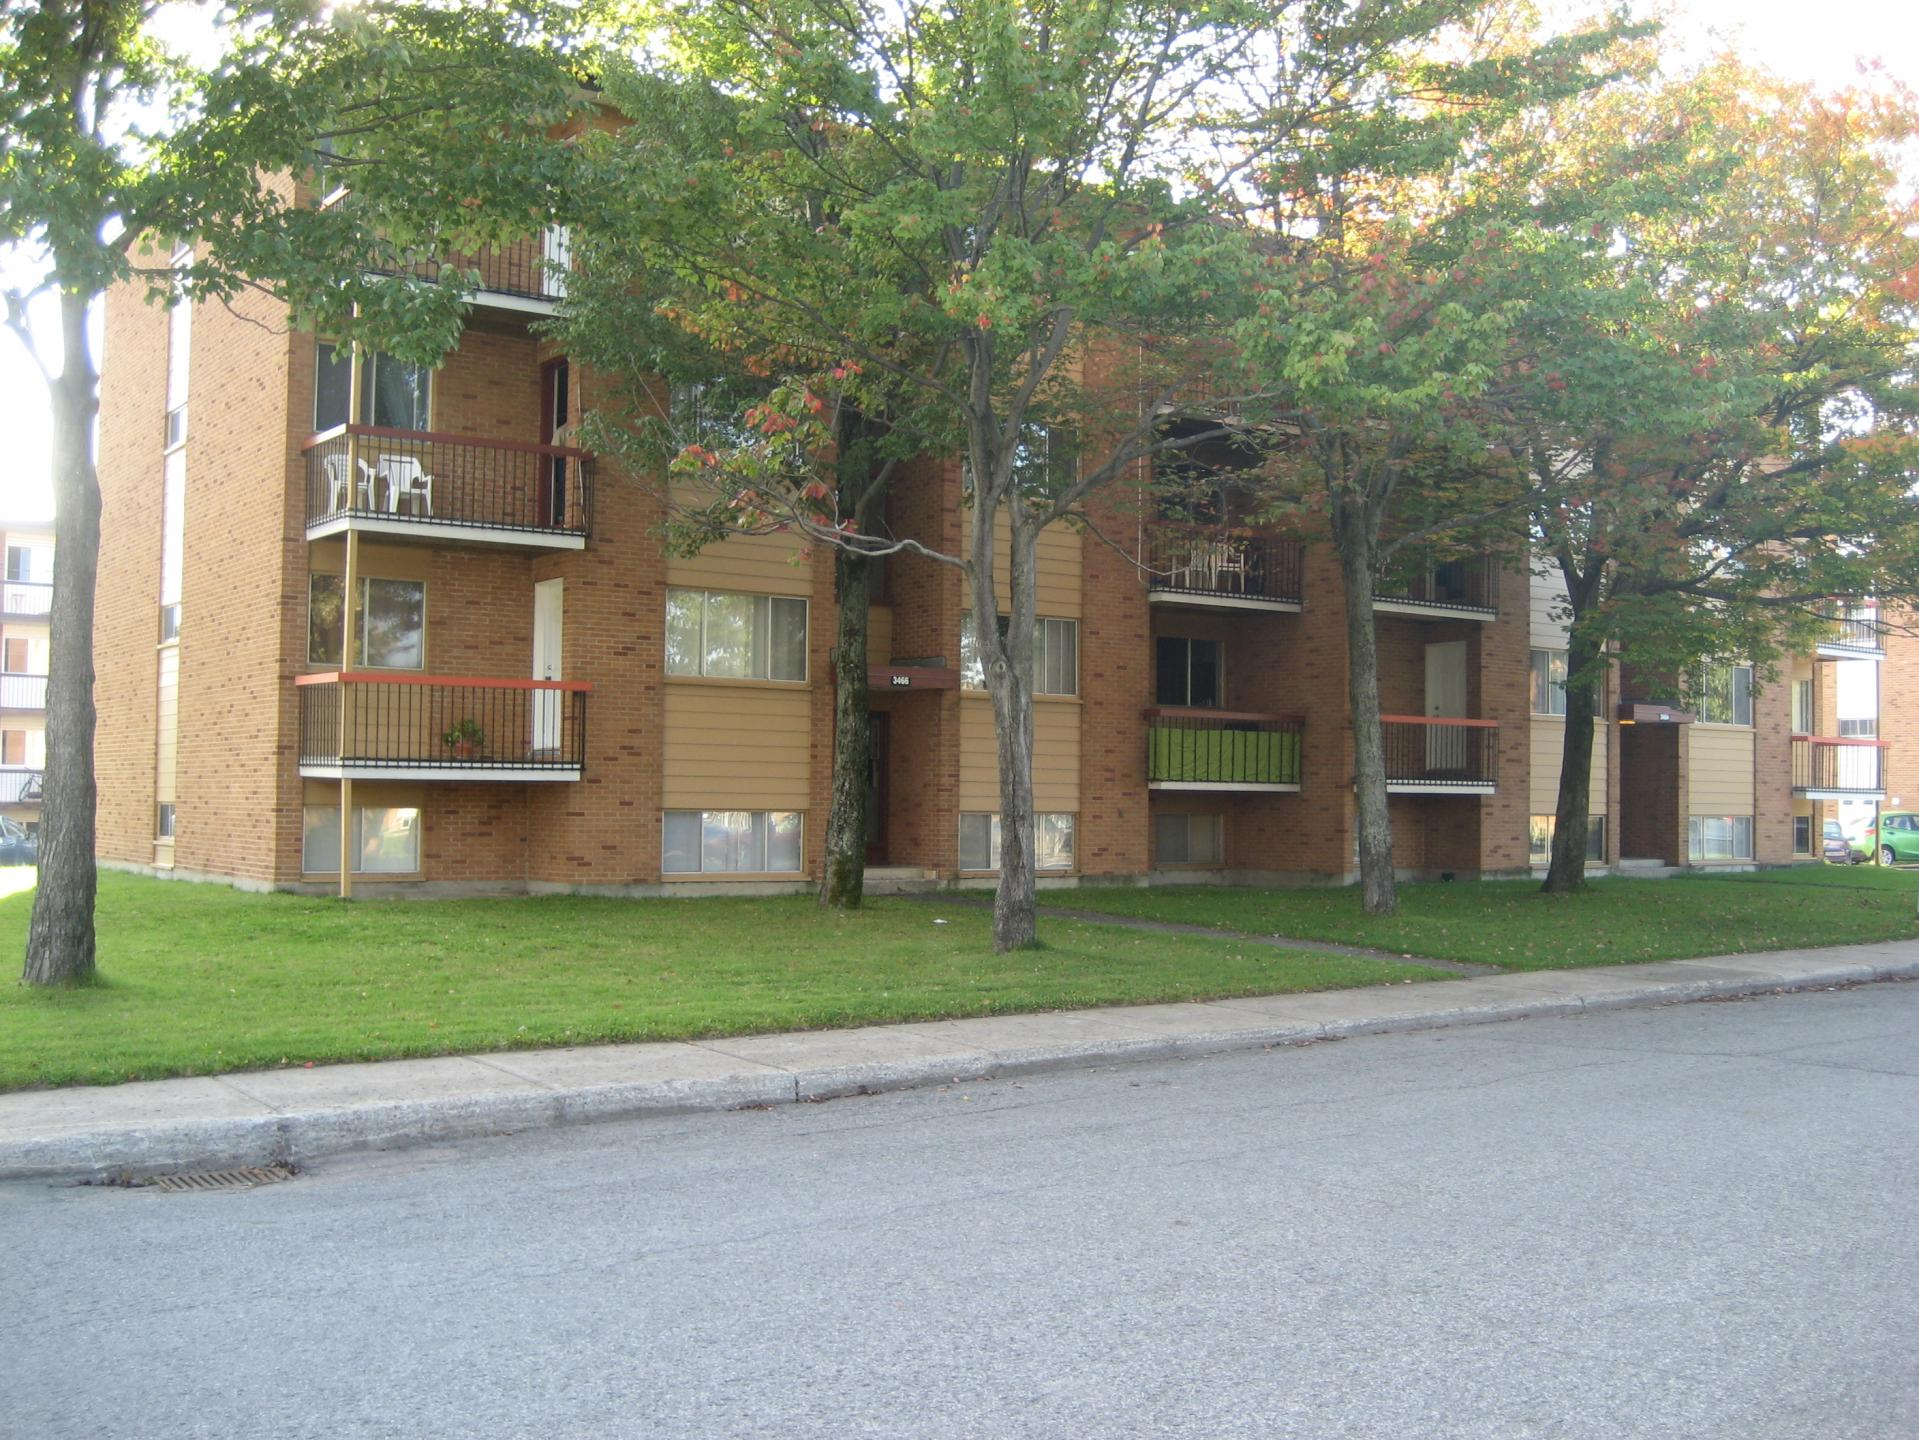 Immeubles ste foy septembre 2011 6